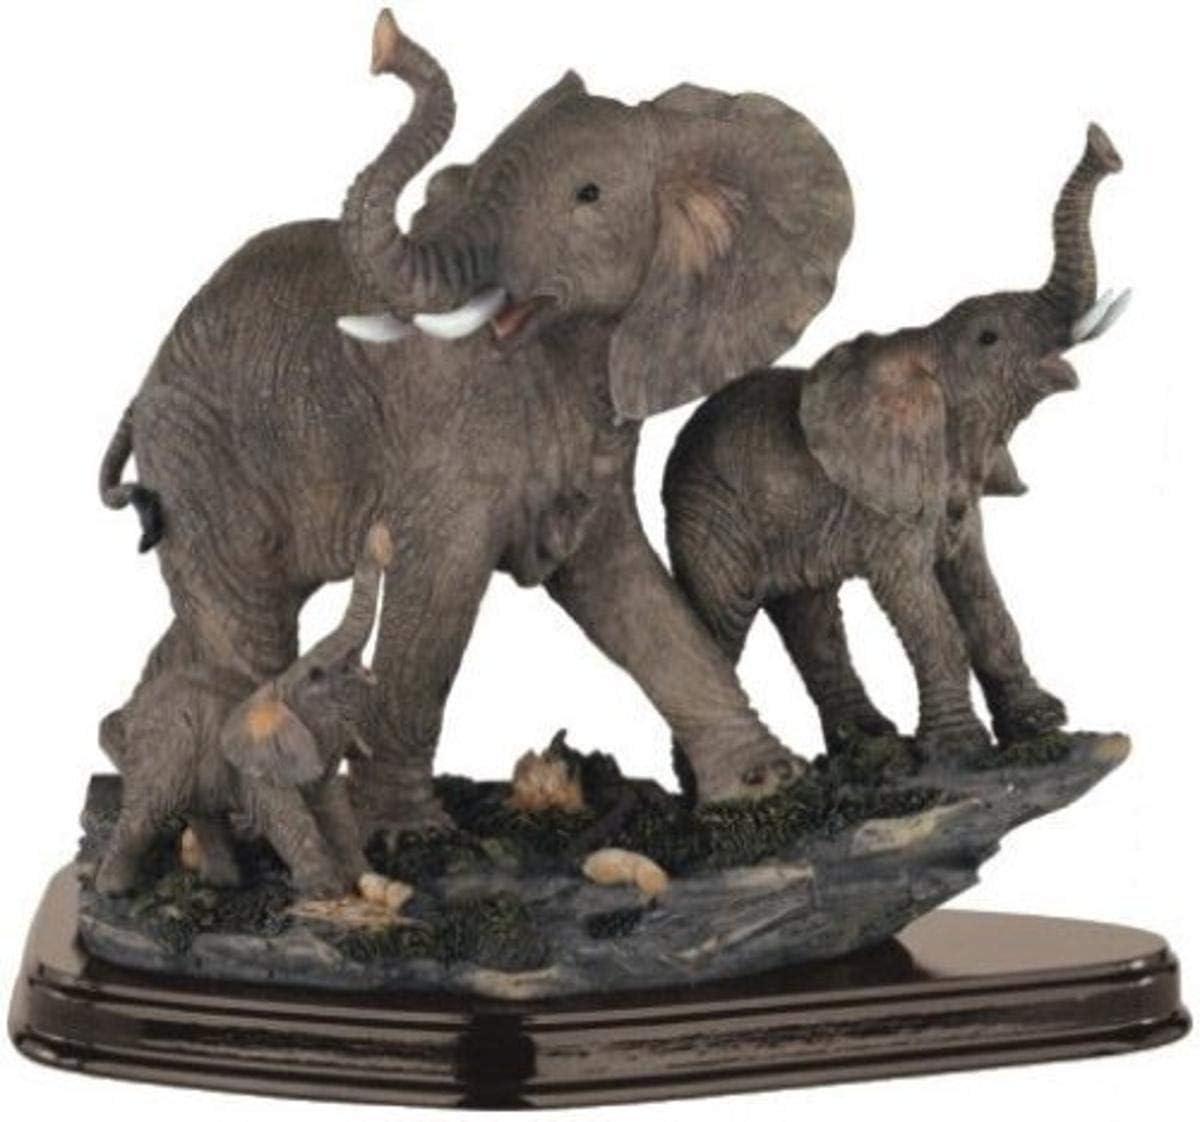 StealStreet SS-G-54070, Family of Wild Elephant Animals Figurine Statue Sculpture